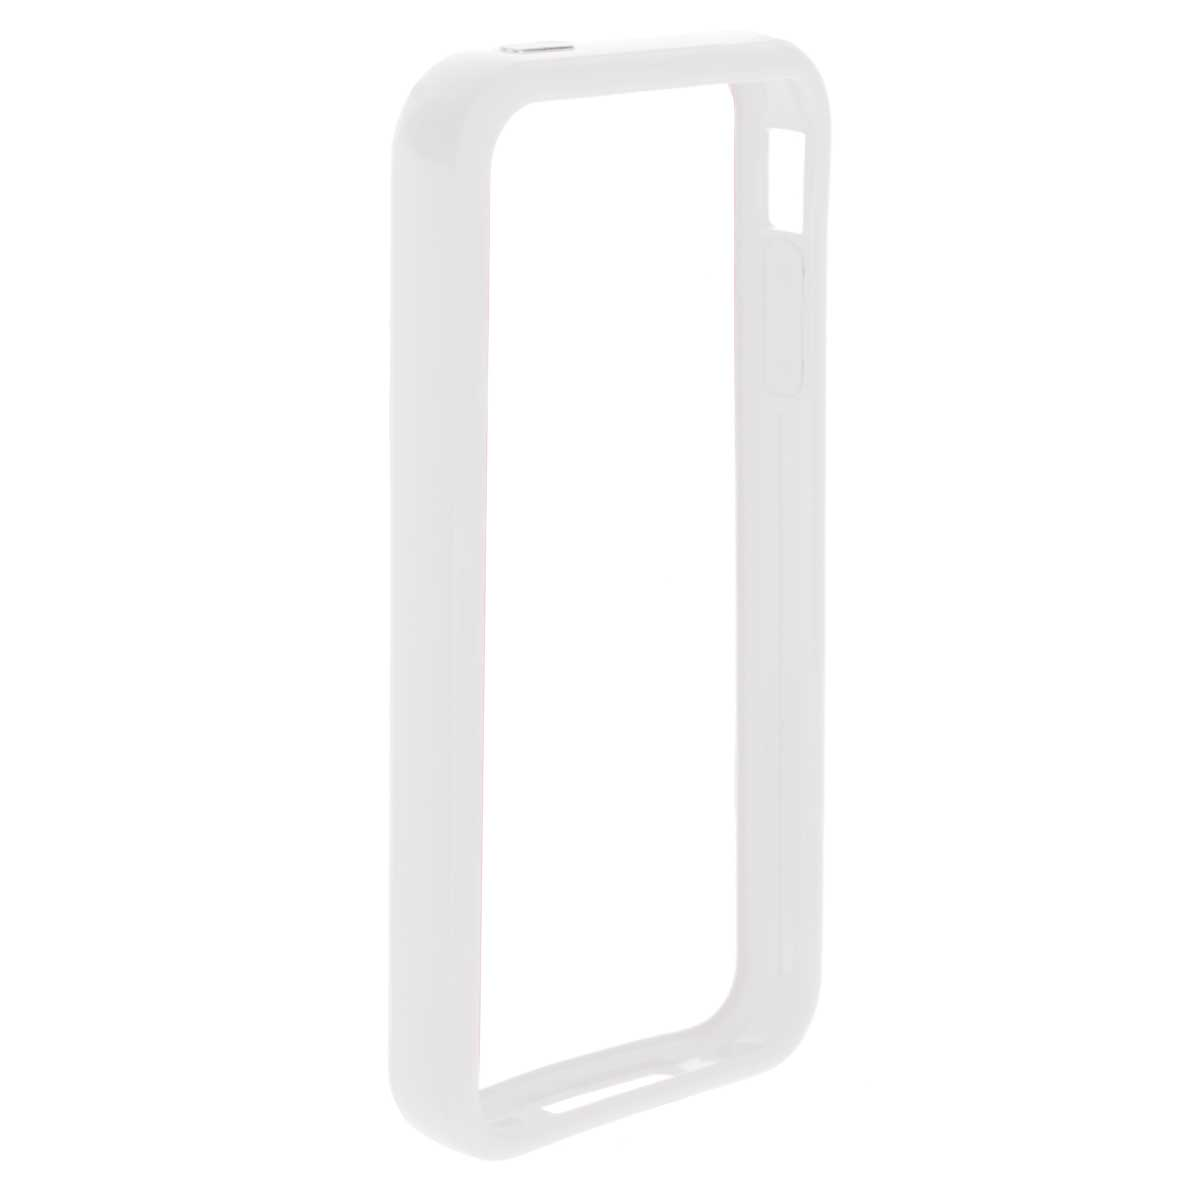 Deppa Bumper чехол-бампер для iPhone 4/4S, White